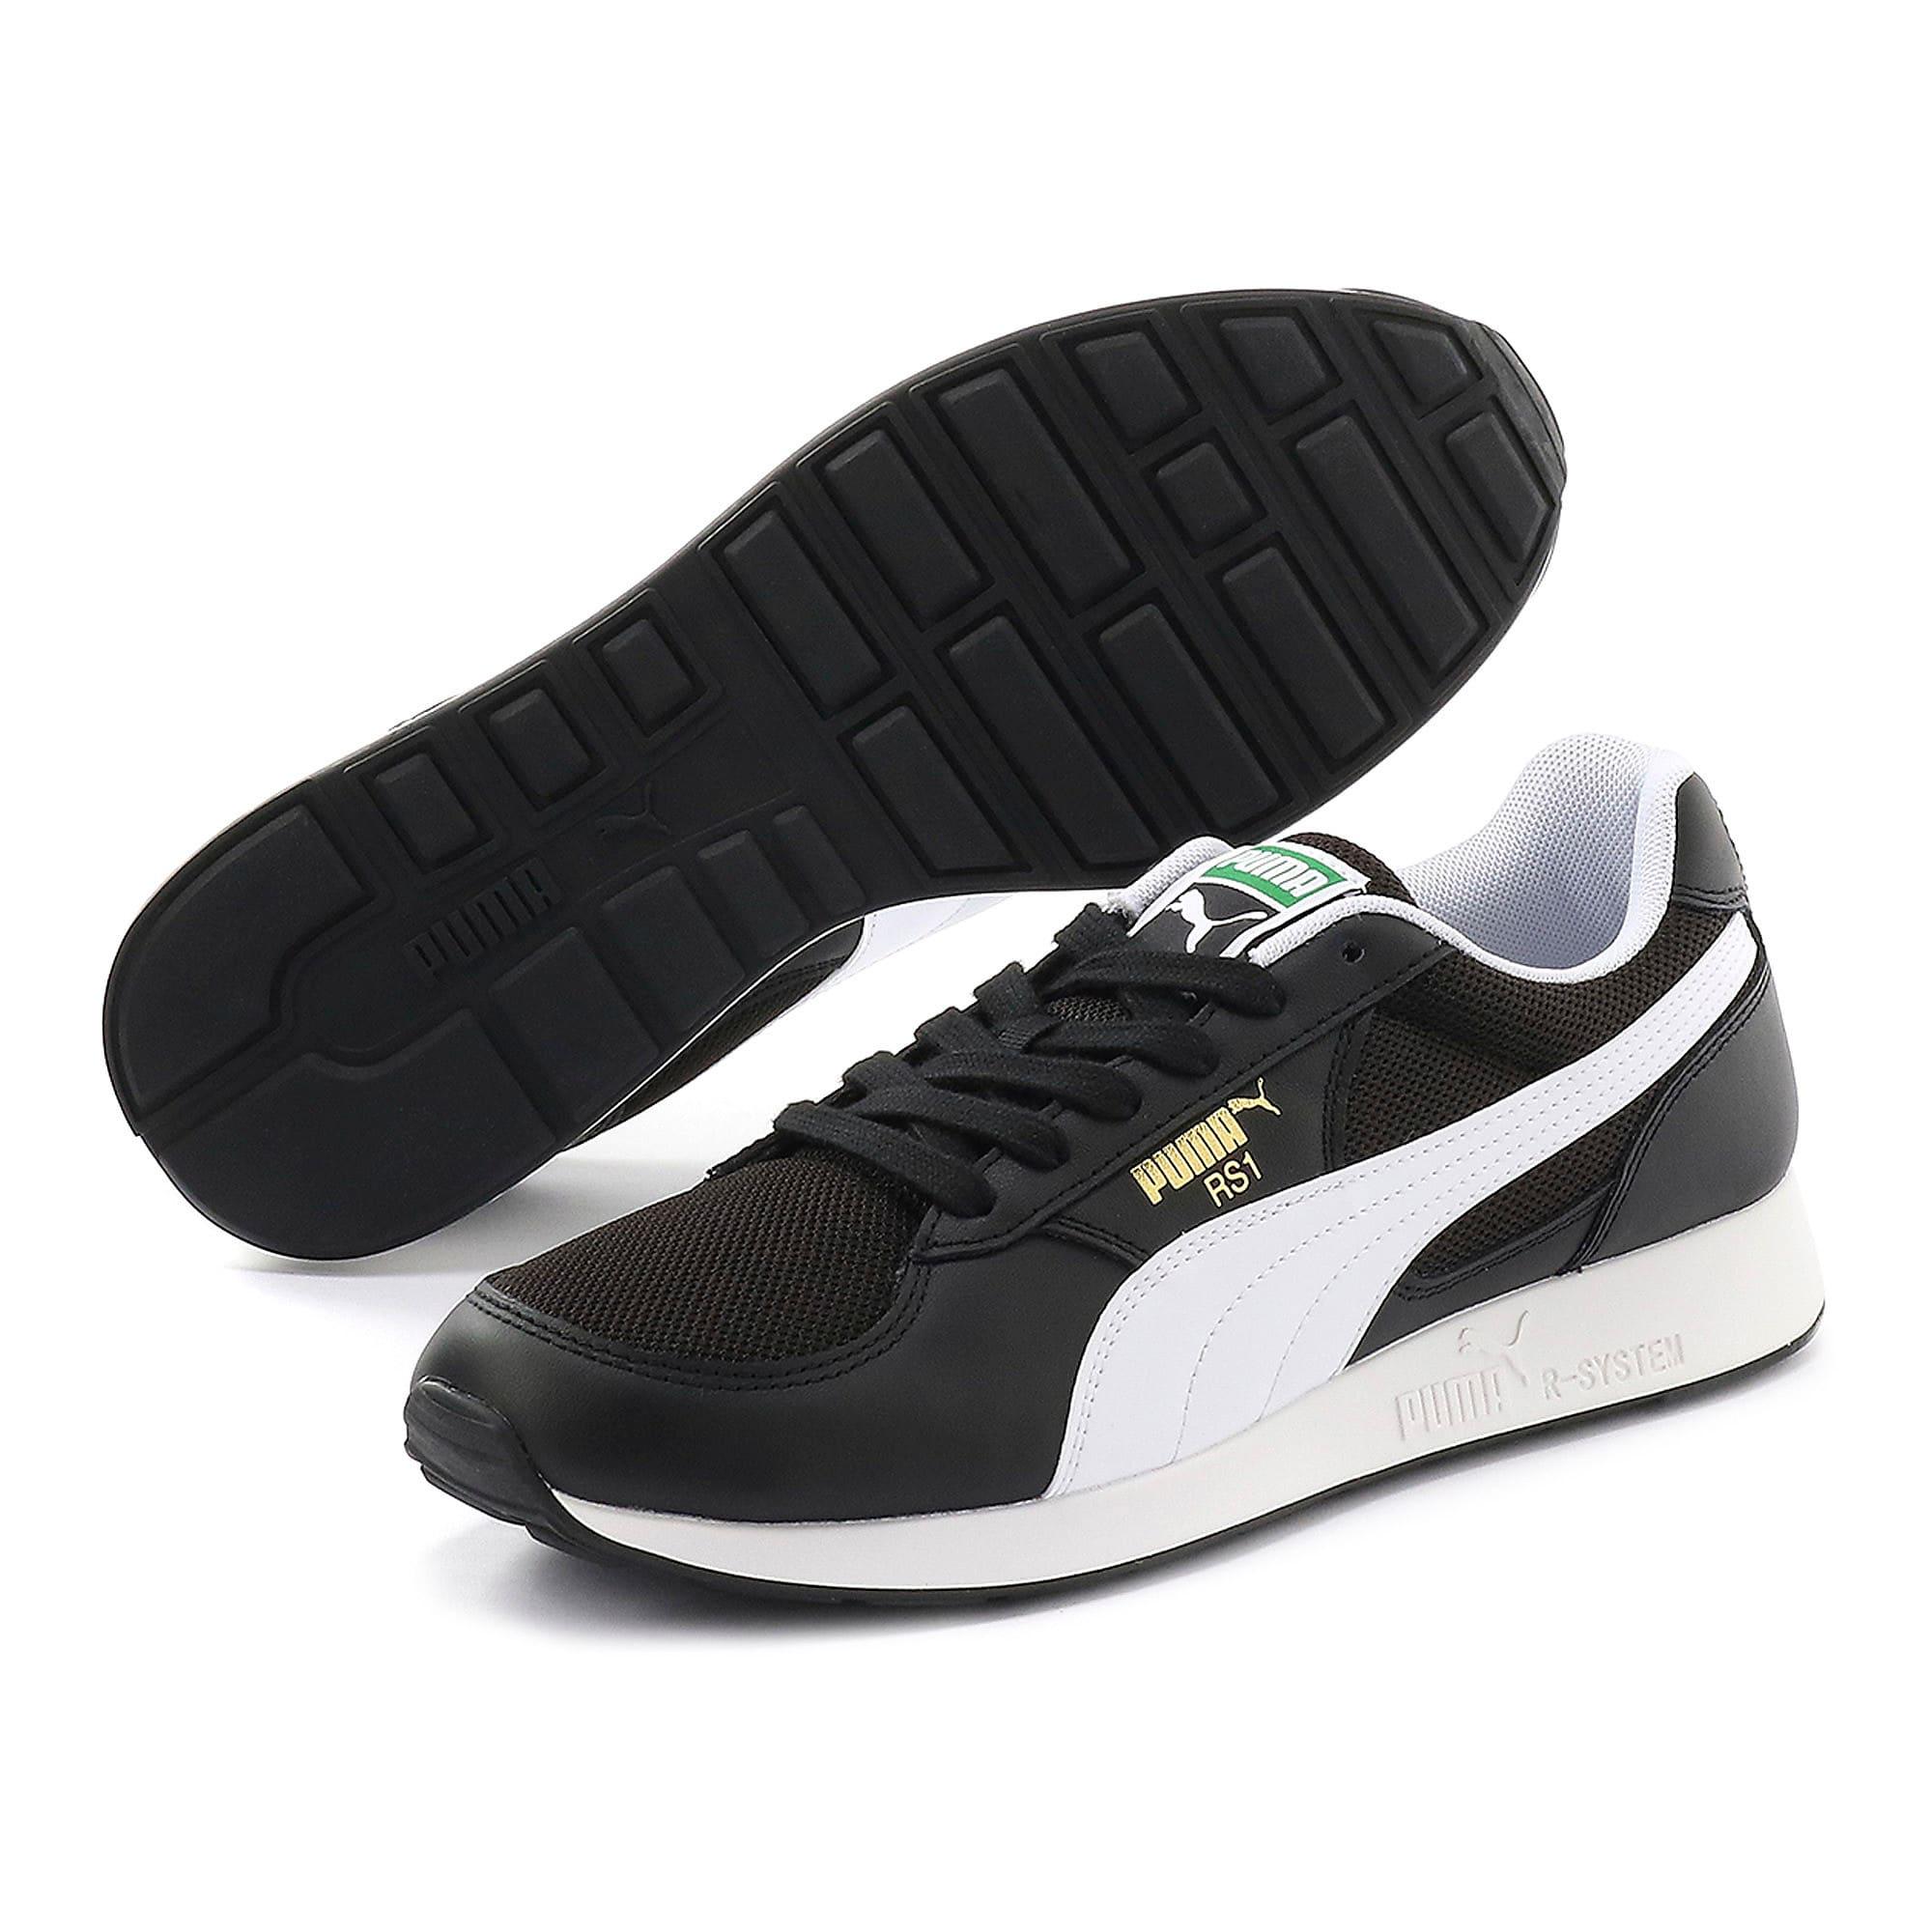 Thumbnail 2 of RS-1 OG CLONE Sneakers, Puma Black-CASTLEROCK, medium